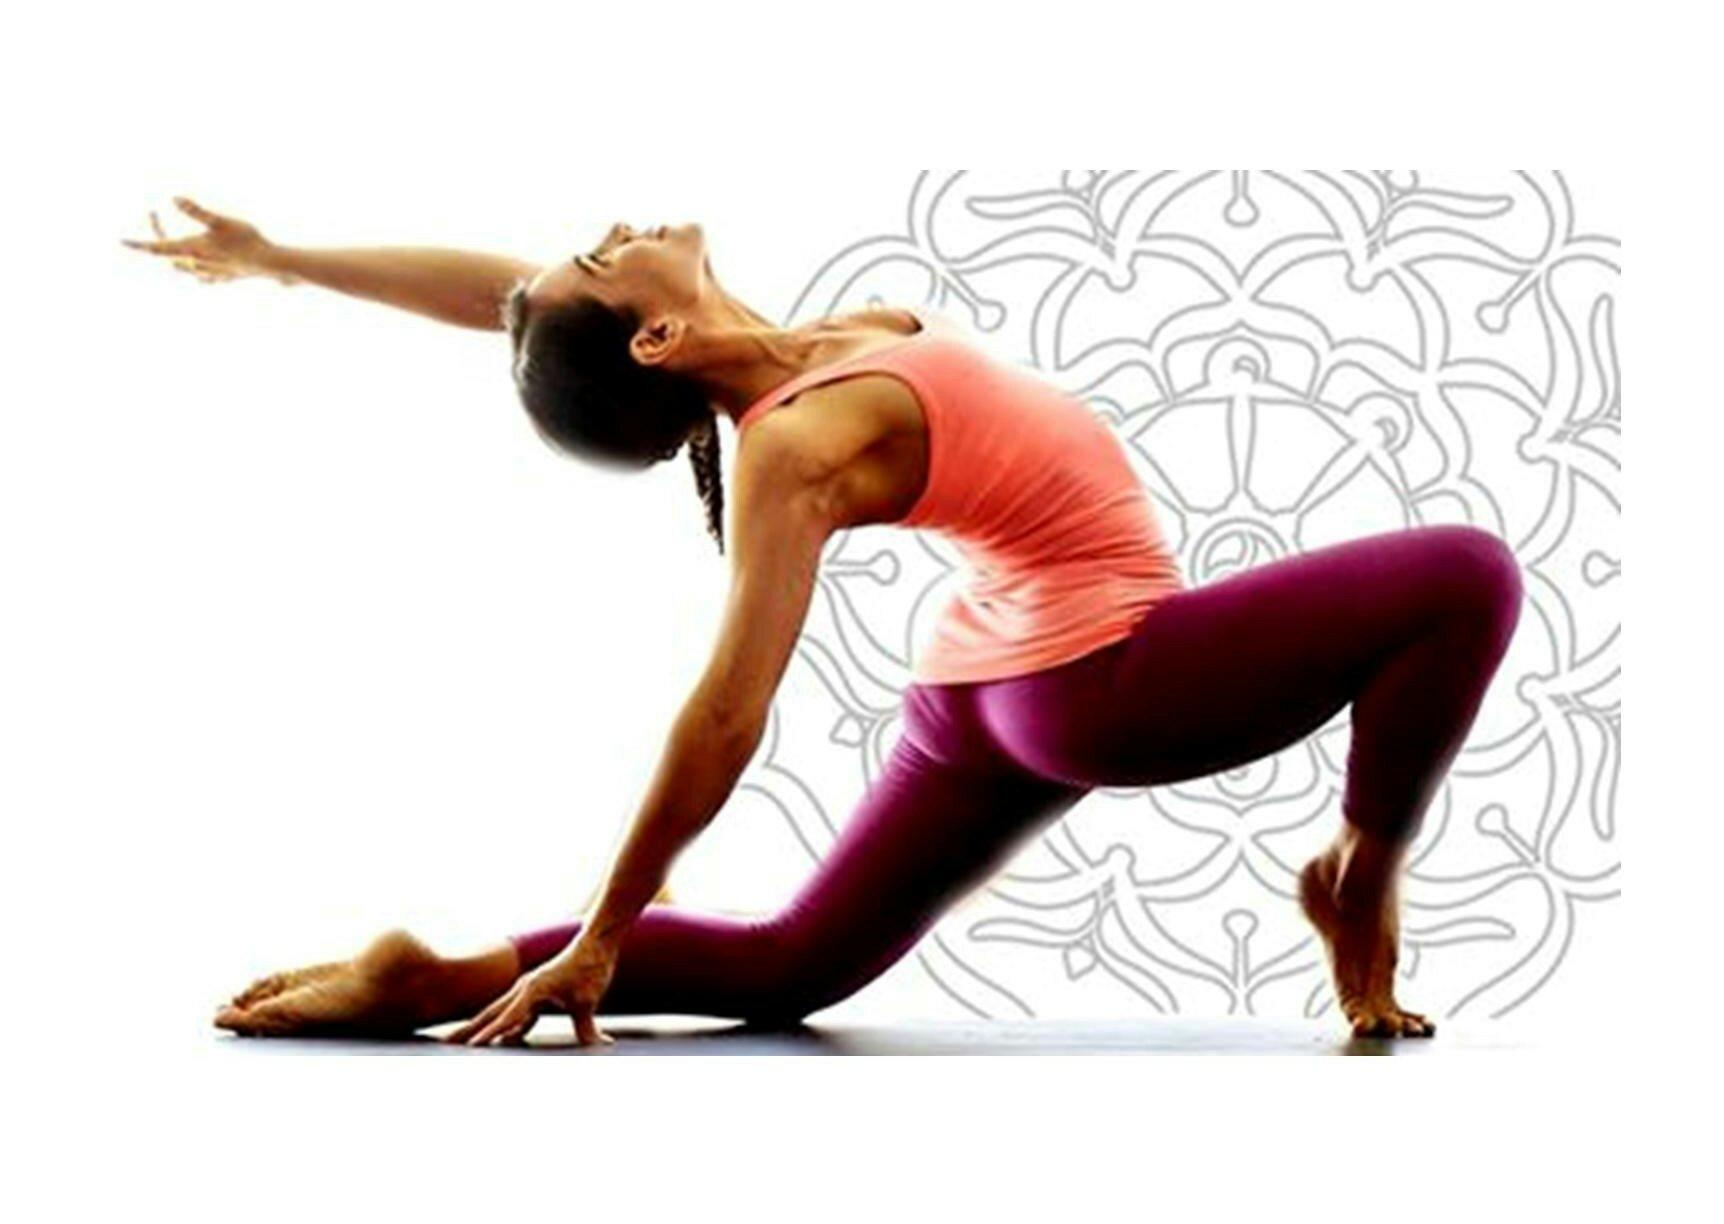 vinyasa-yoga-flow_0-436985023.jpg